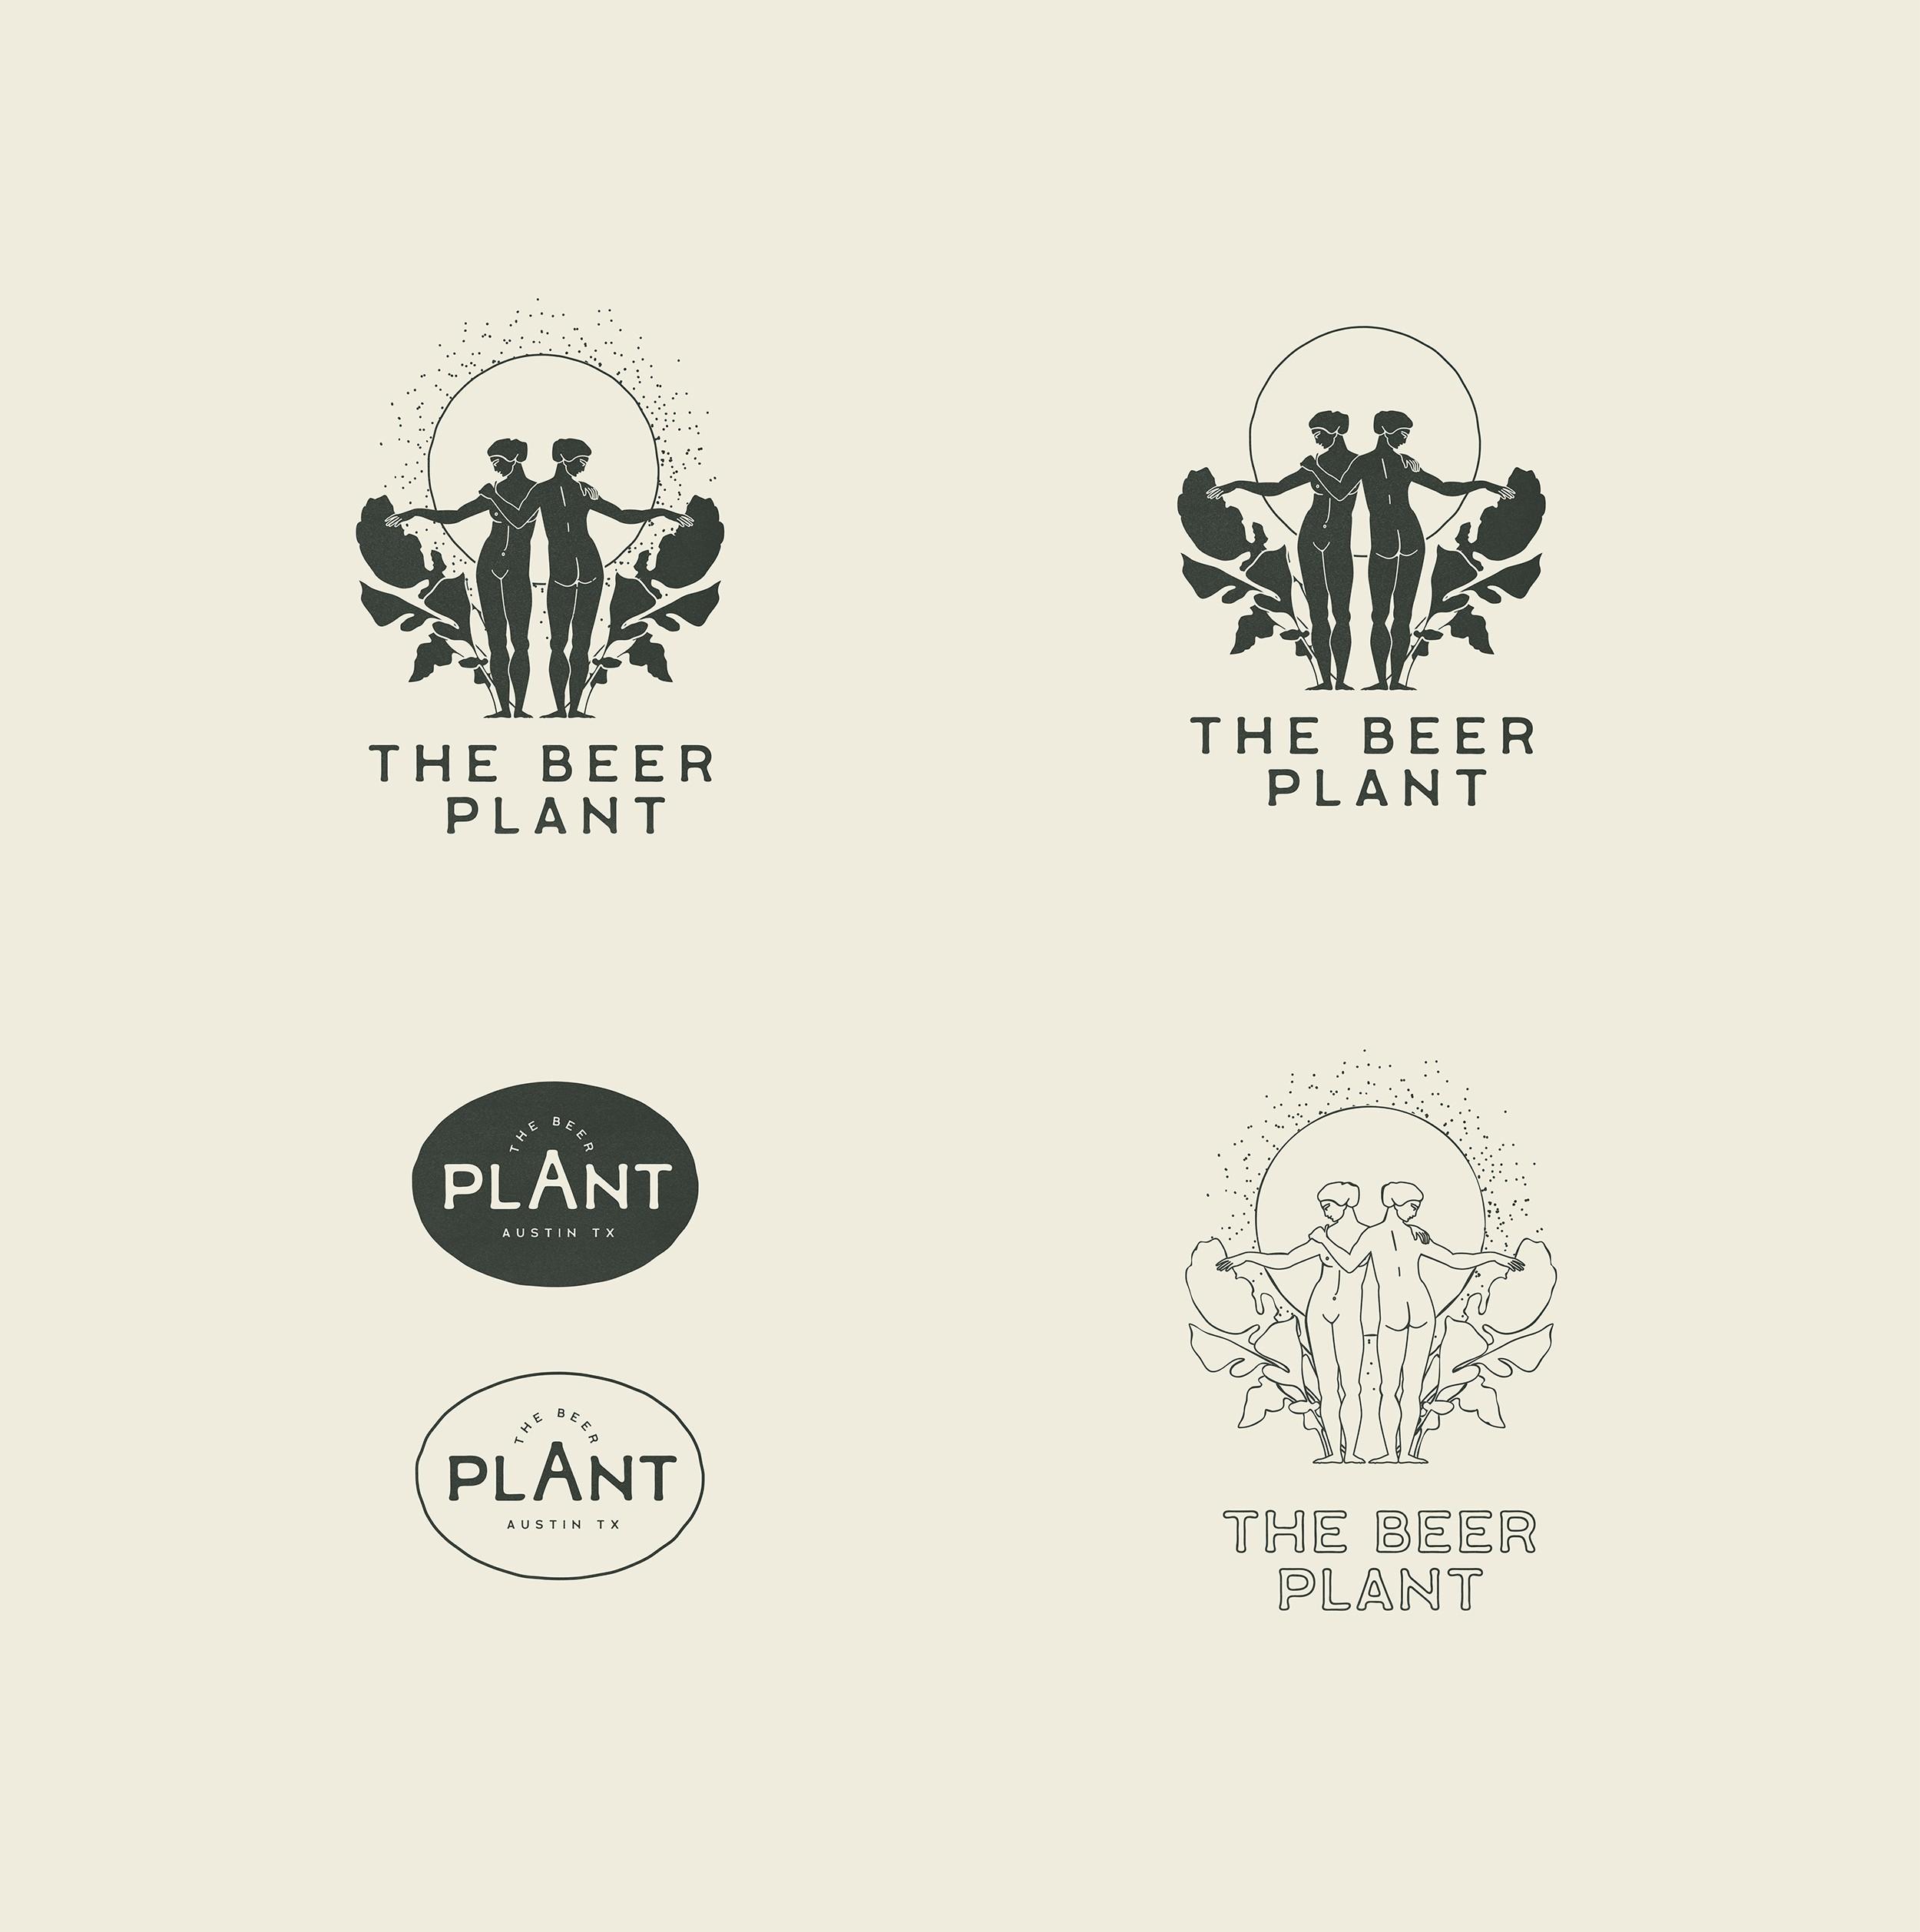 The Beer Plant Logo & Branding Identity